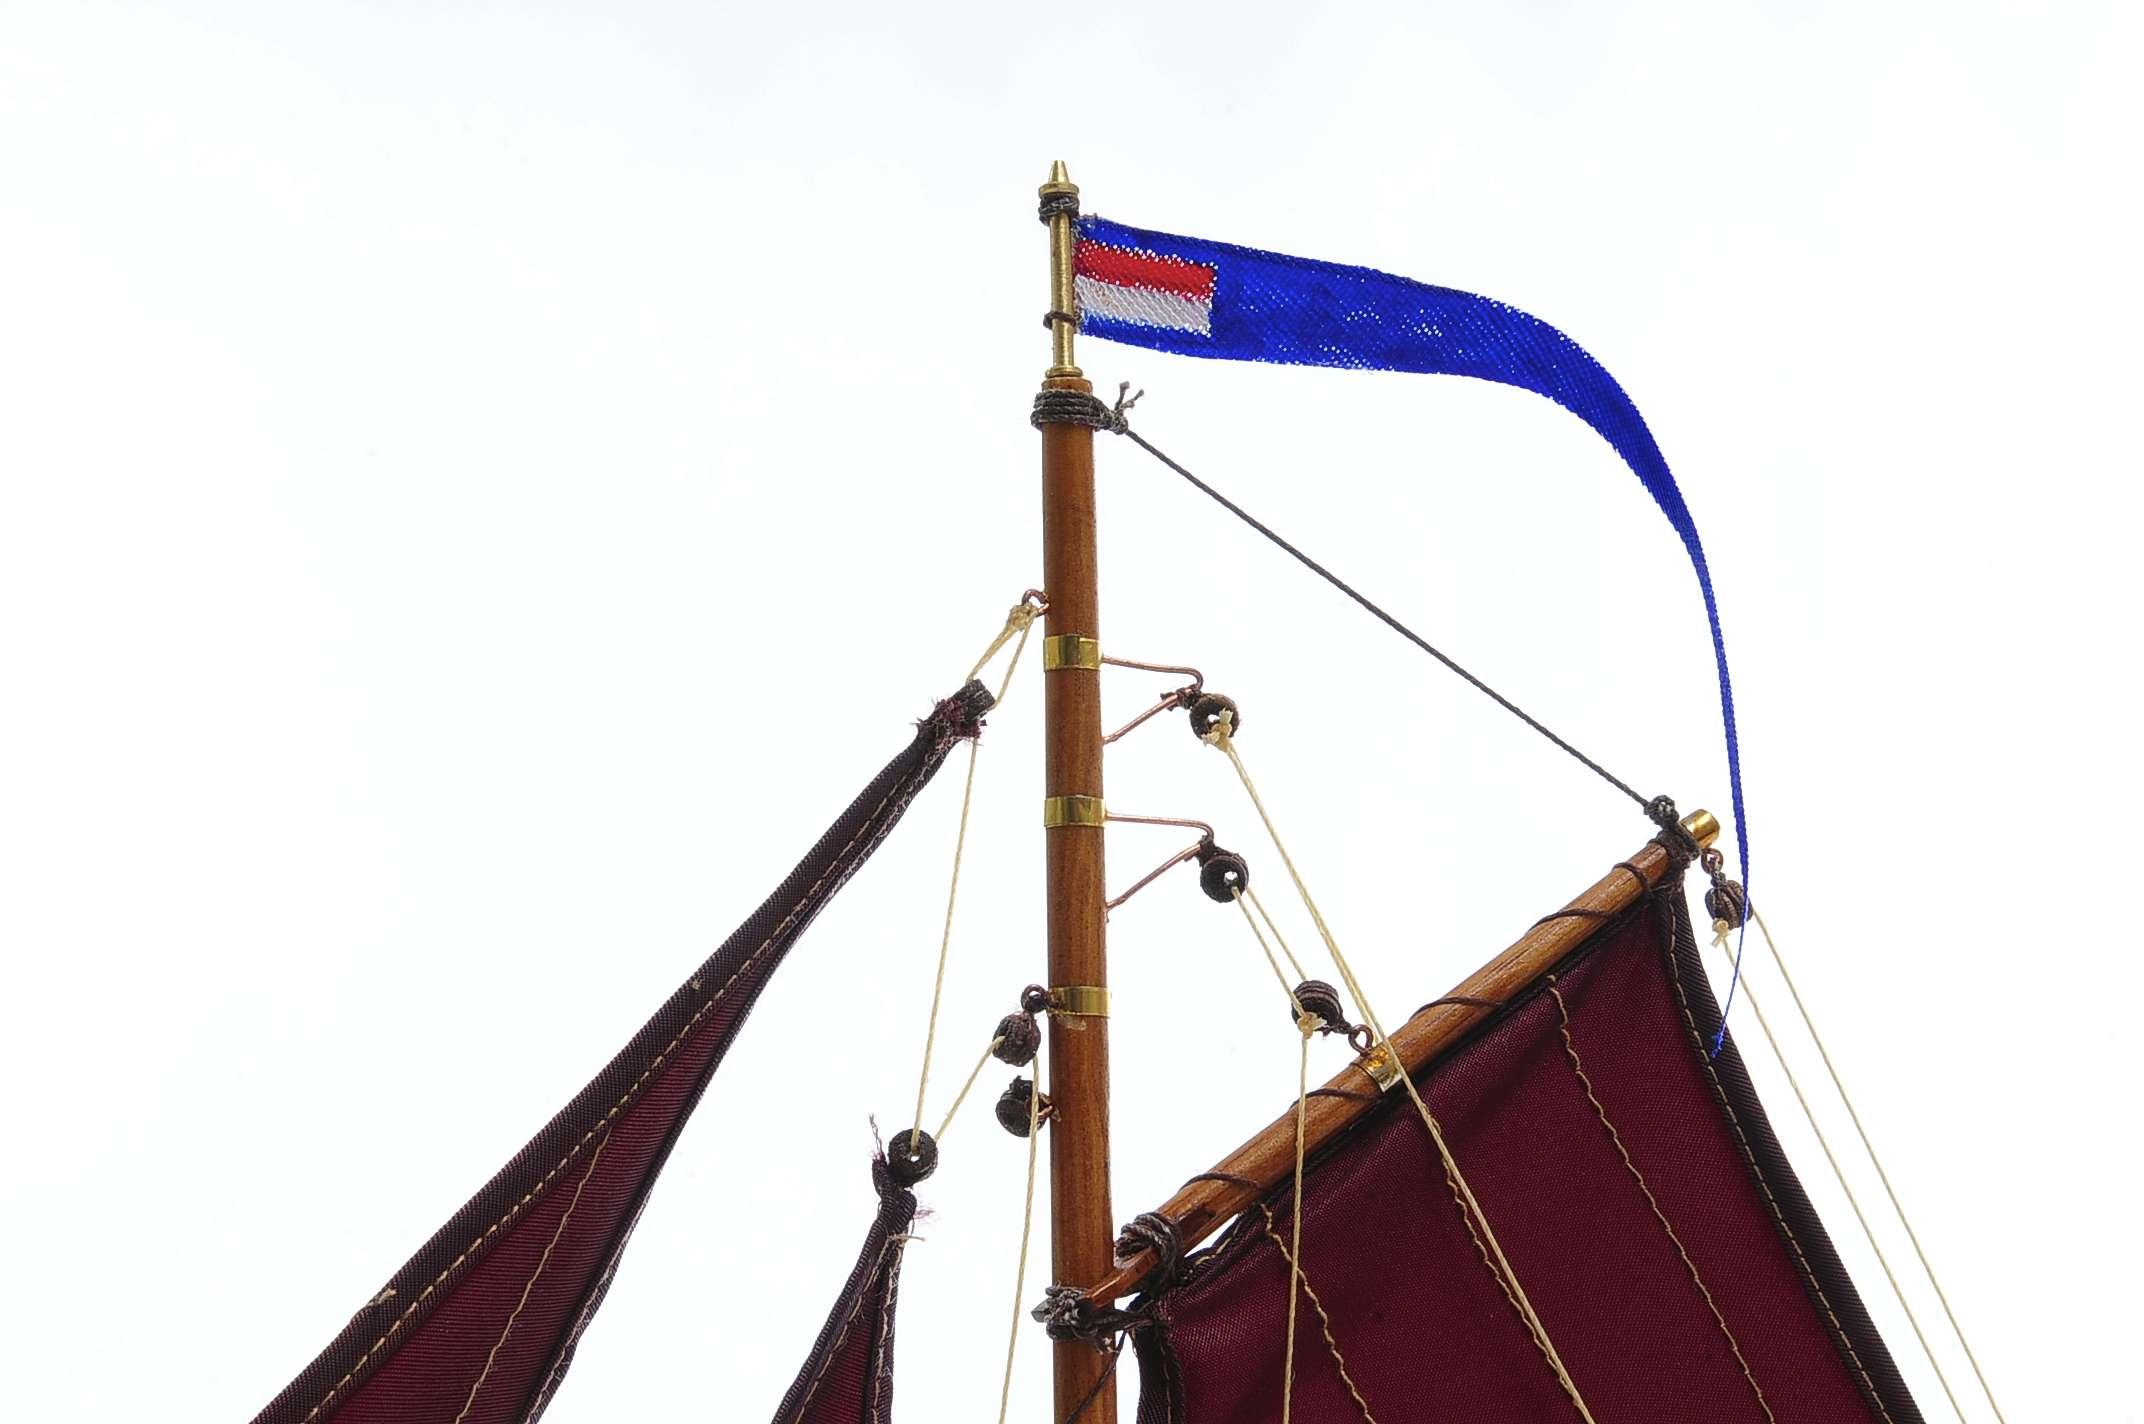 1432-4578-Dutch-Marker-Roundbow-Model-Boat